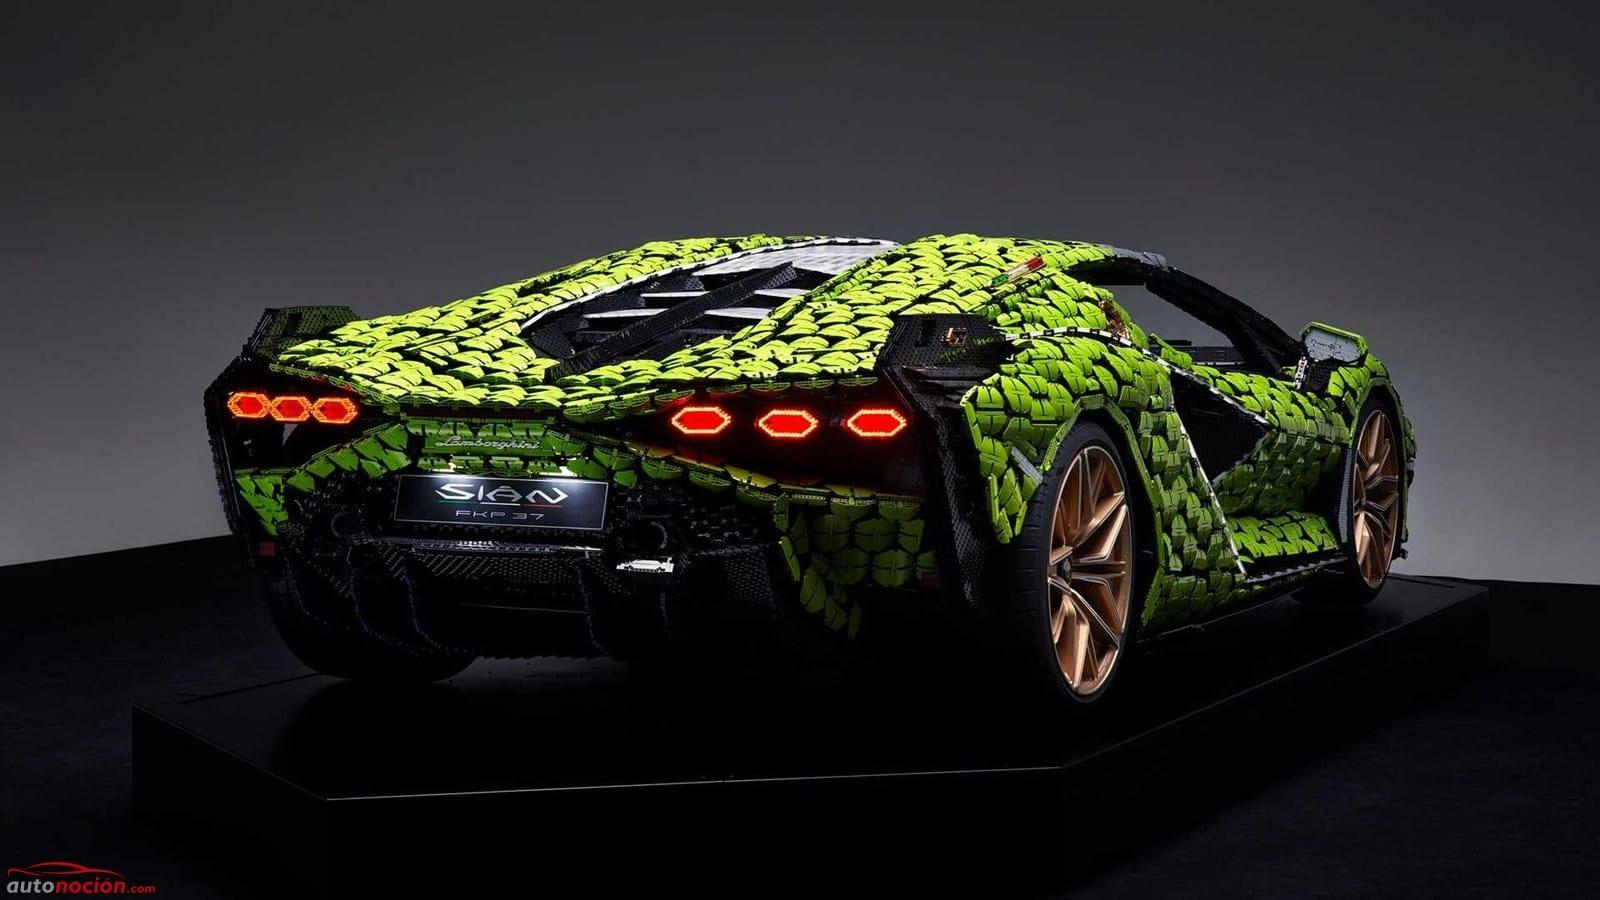 Lamborghini Sian de LEGO a tamaño real